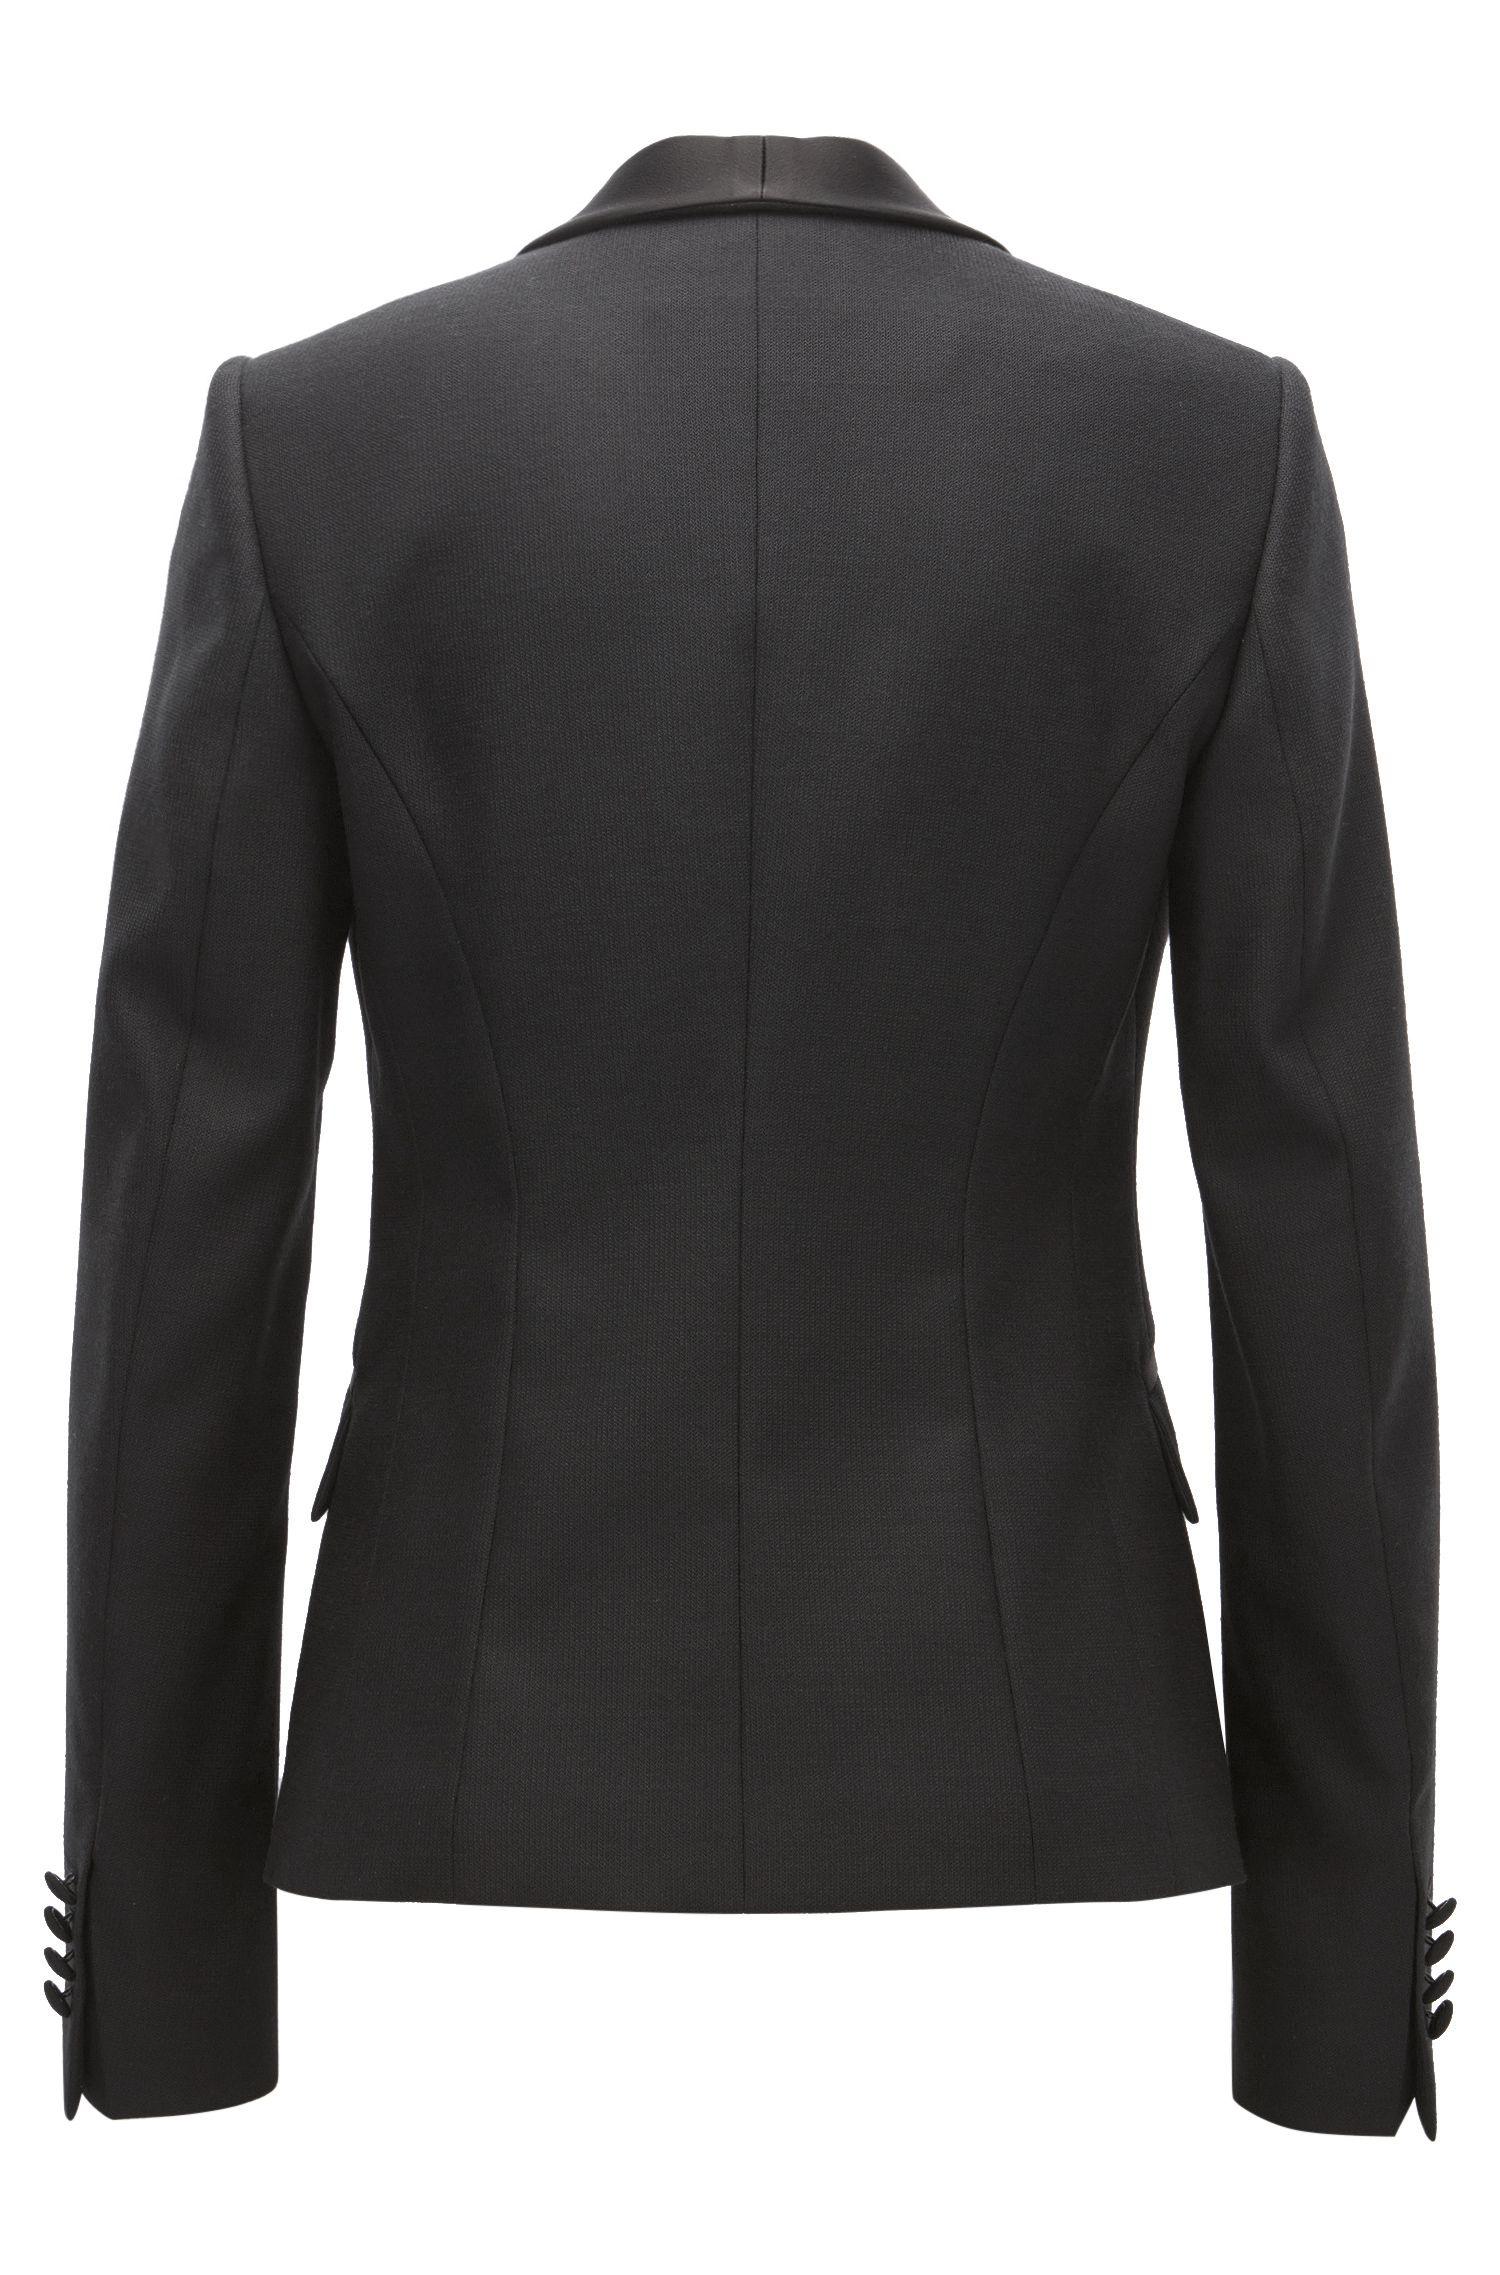 Virgin Wool Tuxedo Jacket | Jivuna